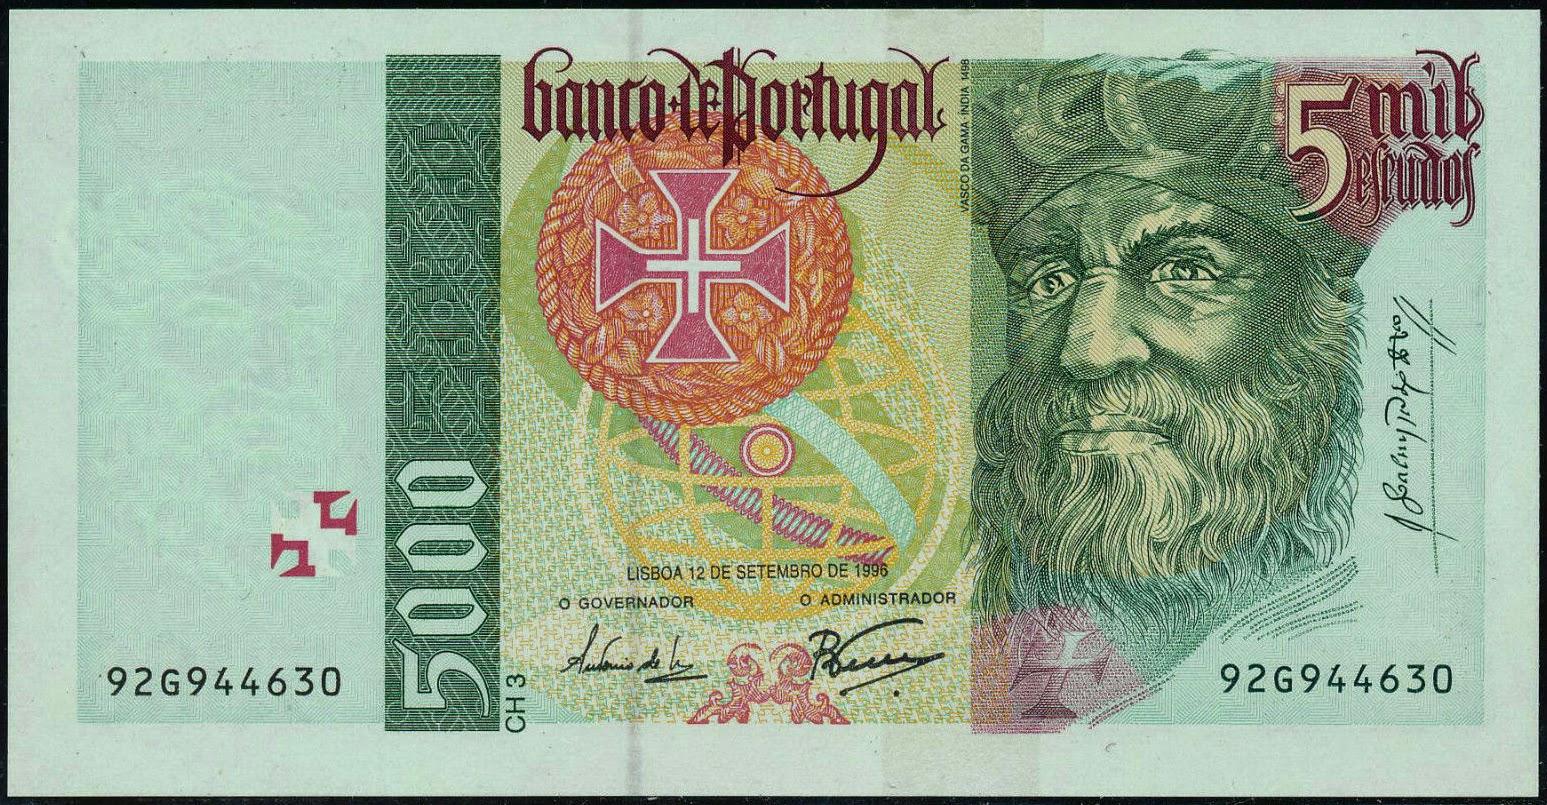 portugal 5000 escudos banknote 1996 vasco da gama